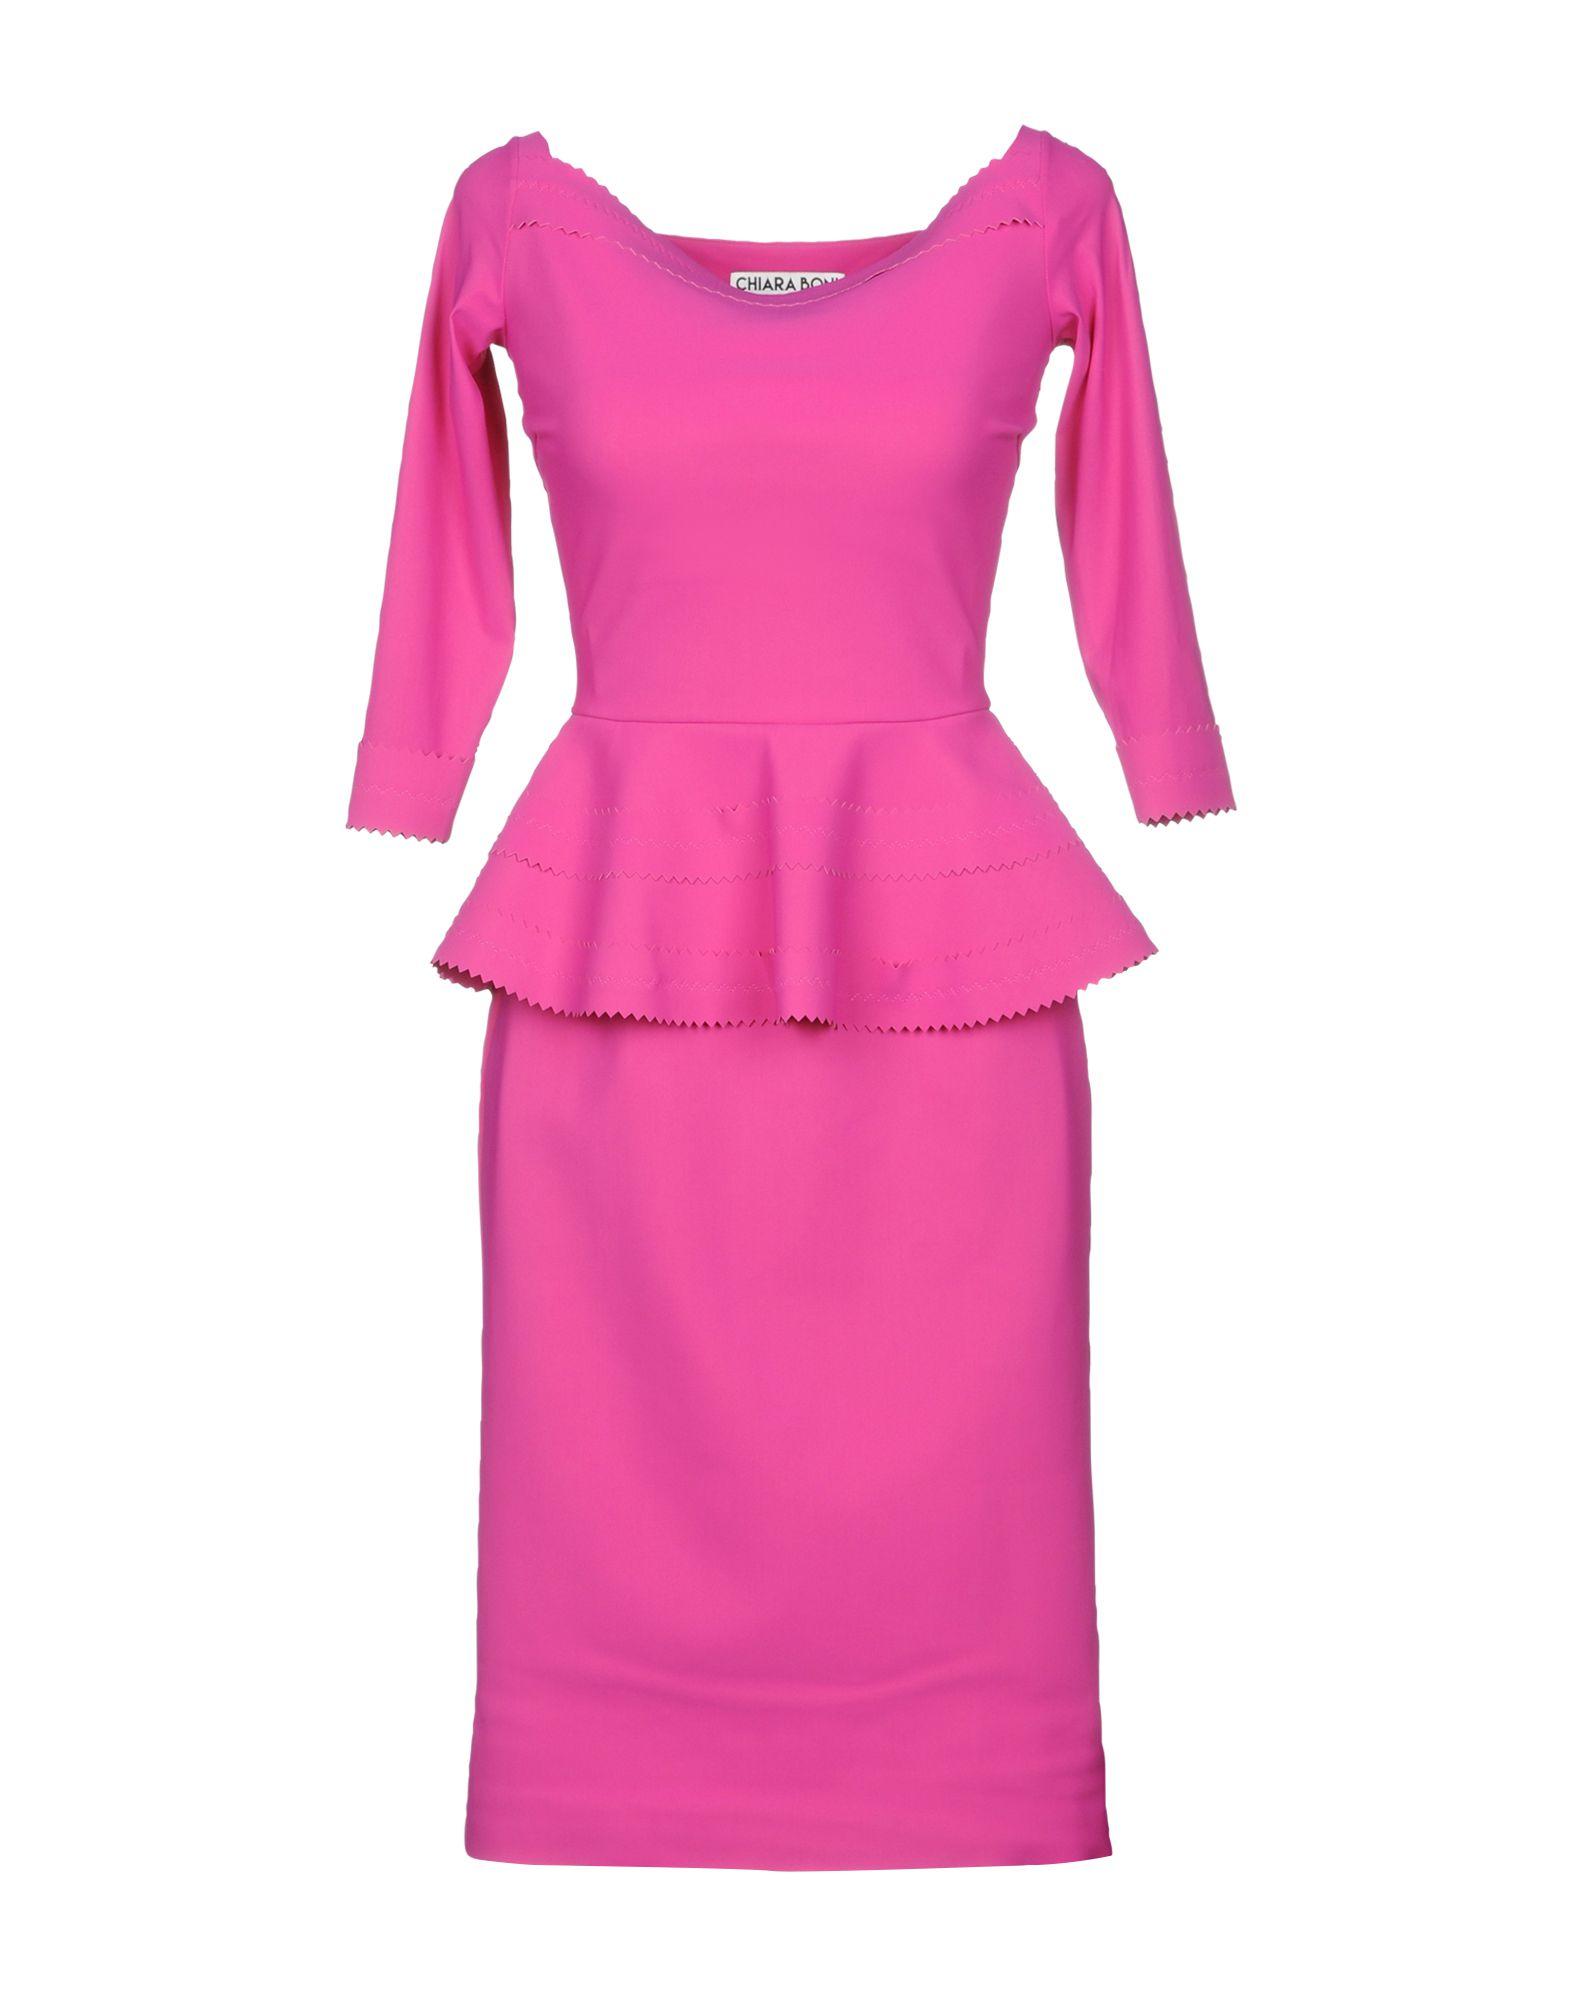 4110f3eabbf Chiara Boni La Petite Robe Knee-Length Dress In Fuchsia